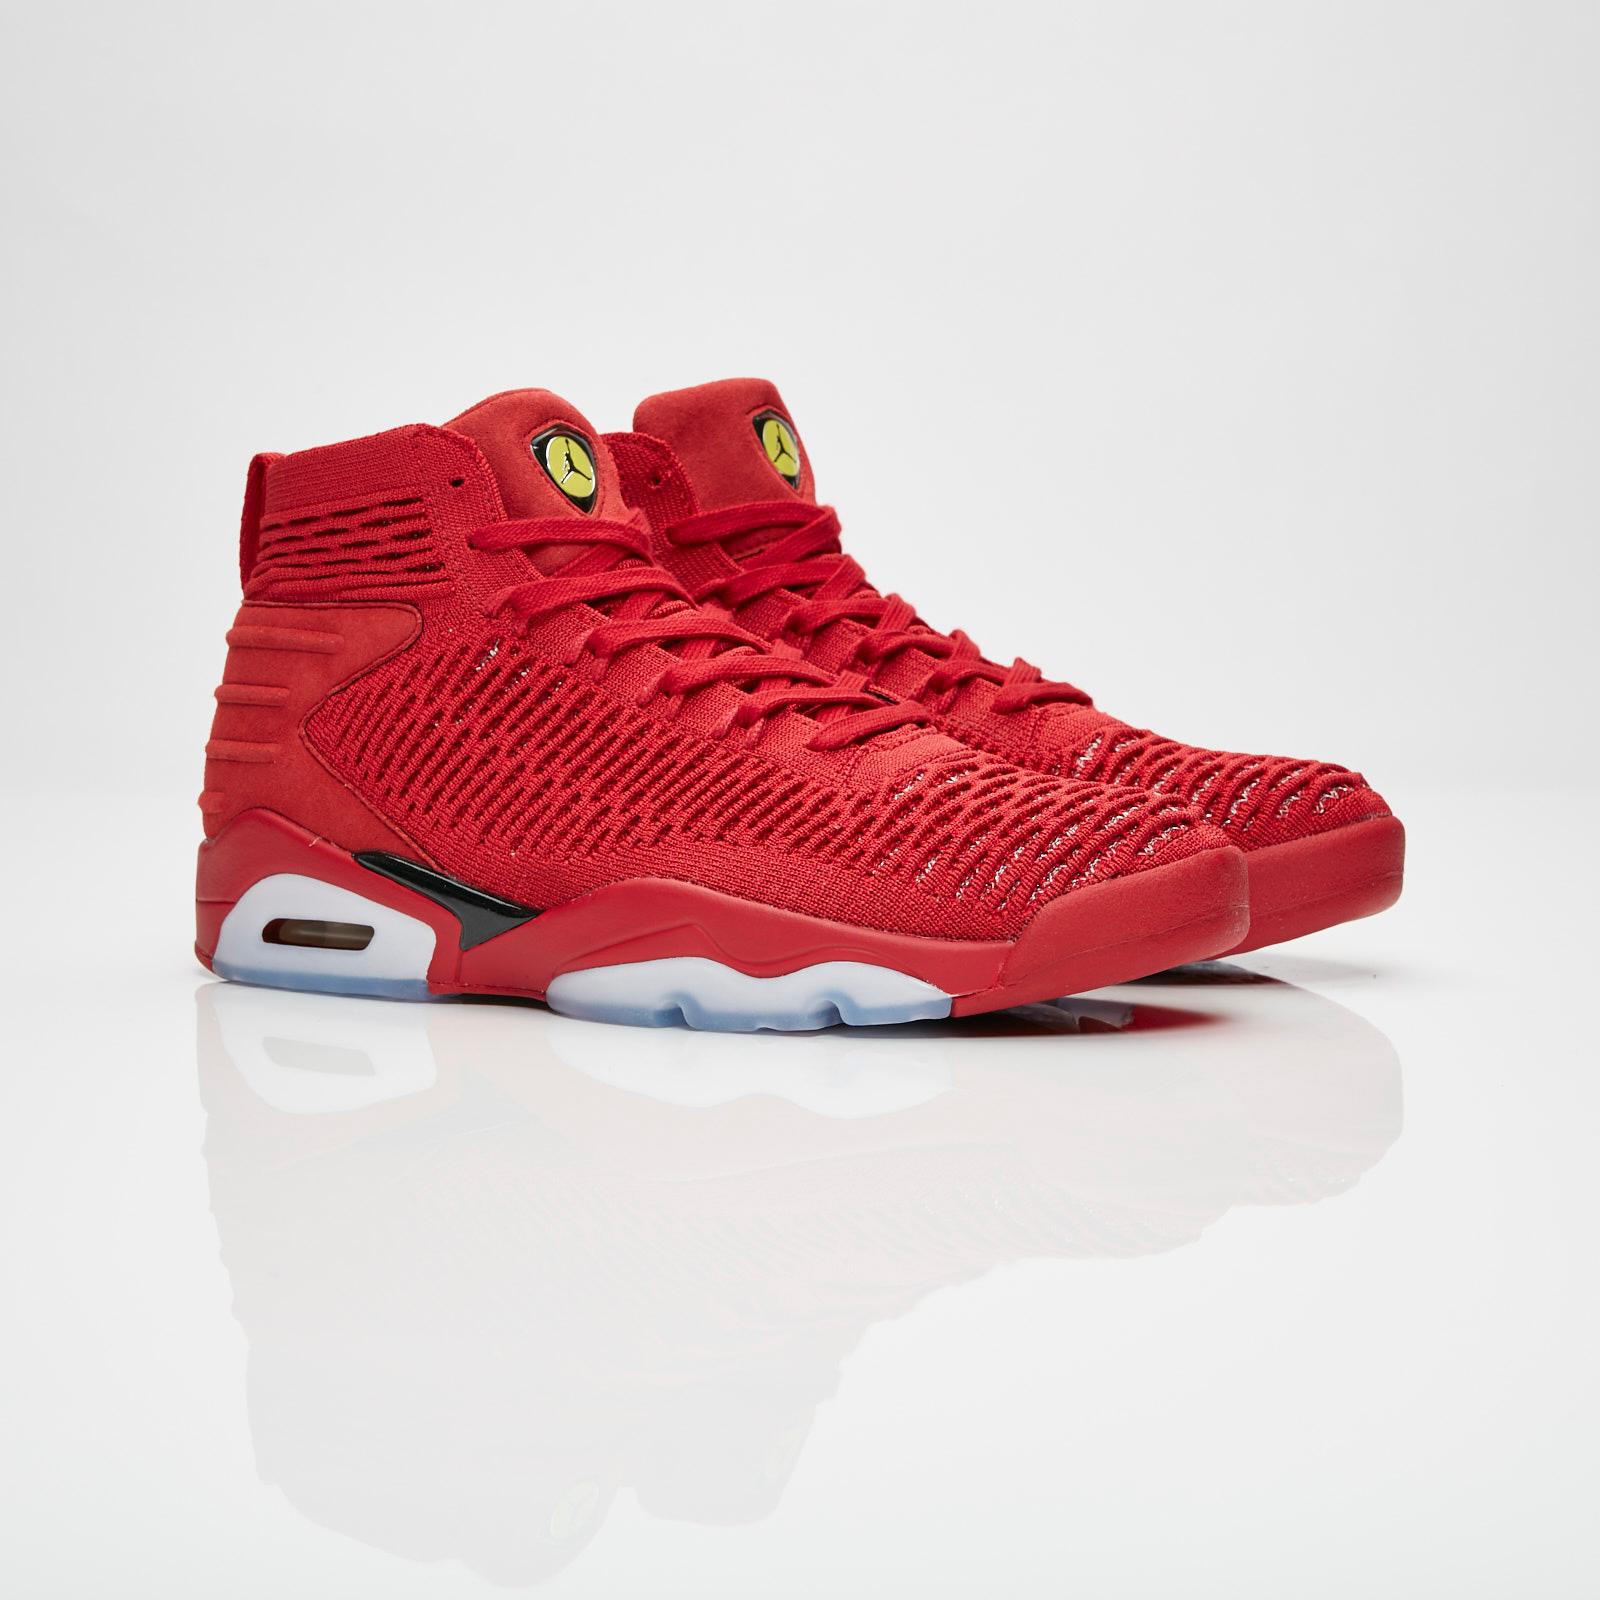 sale retailer 5e0ac 6ab73 Jordan Brand Flyknit Elevation 23